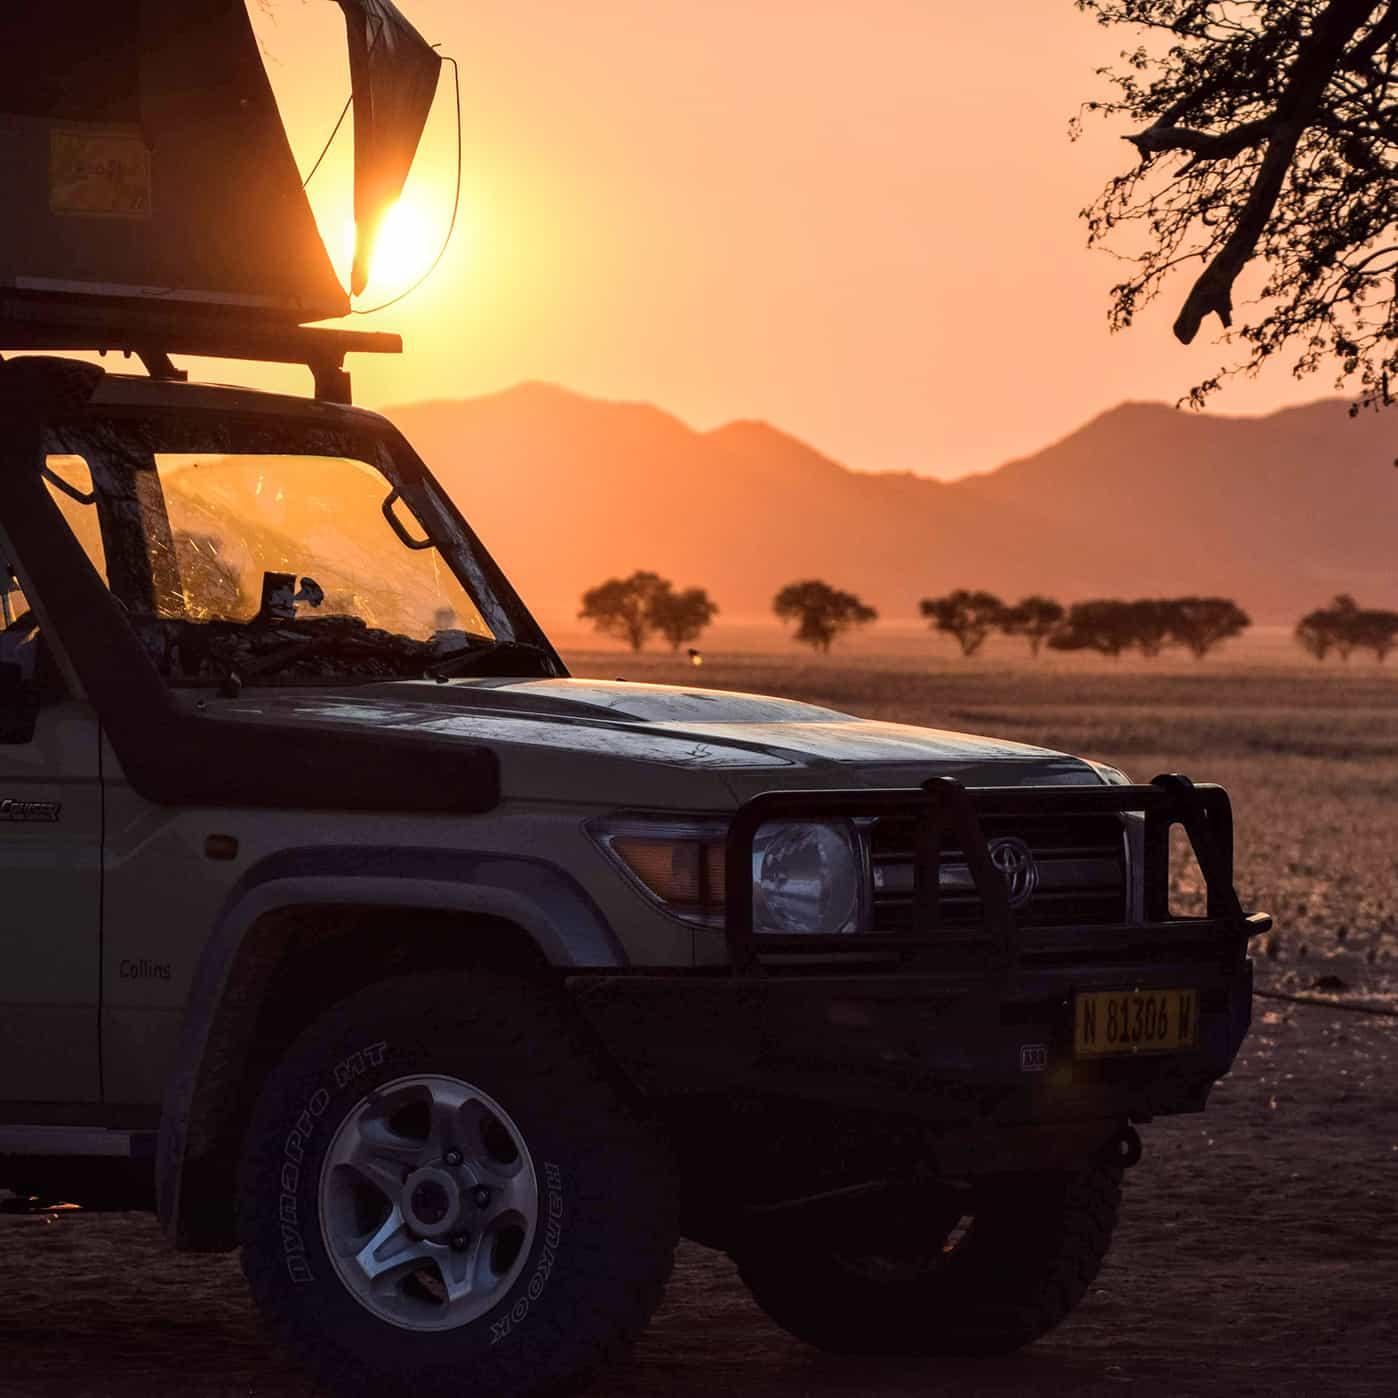 Safari Drive Land Cruiser closeup on an African plain at sunset